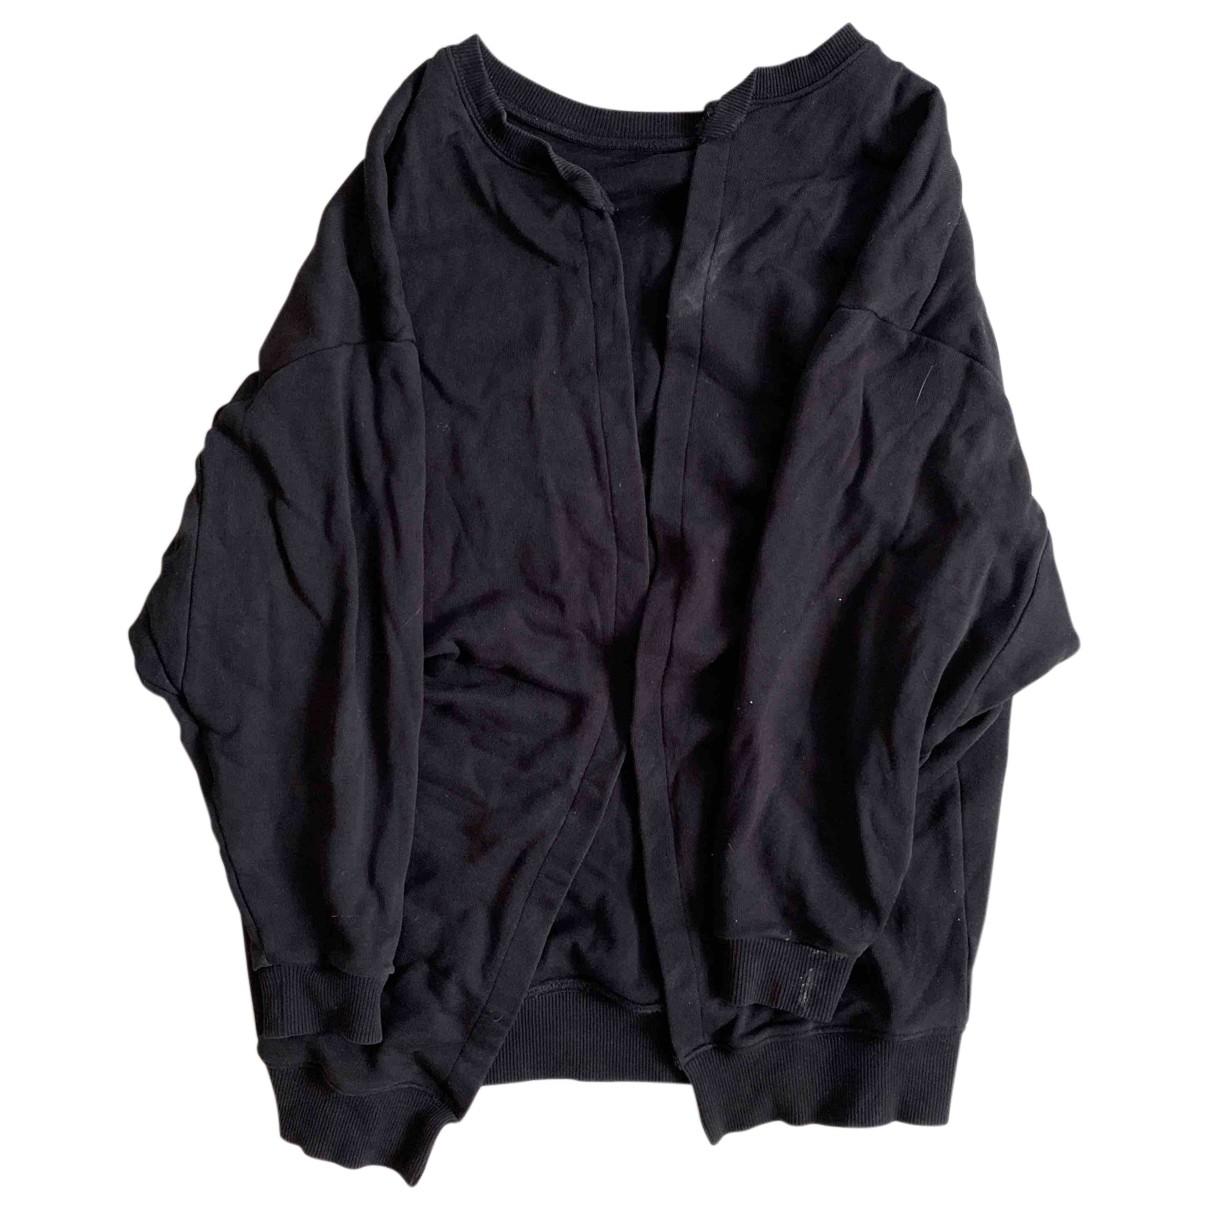 Saint Laurent N Black Cotton Knitwear for Women 34 FR